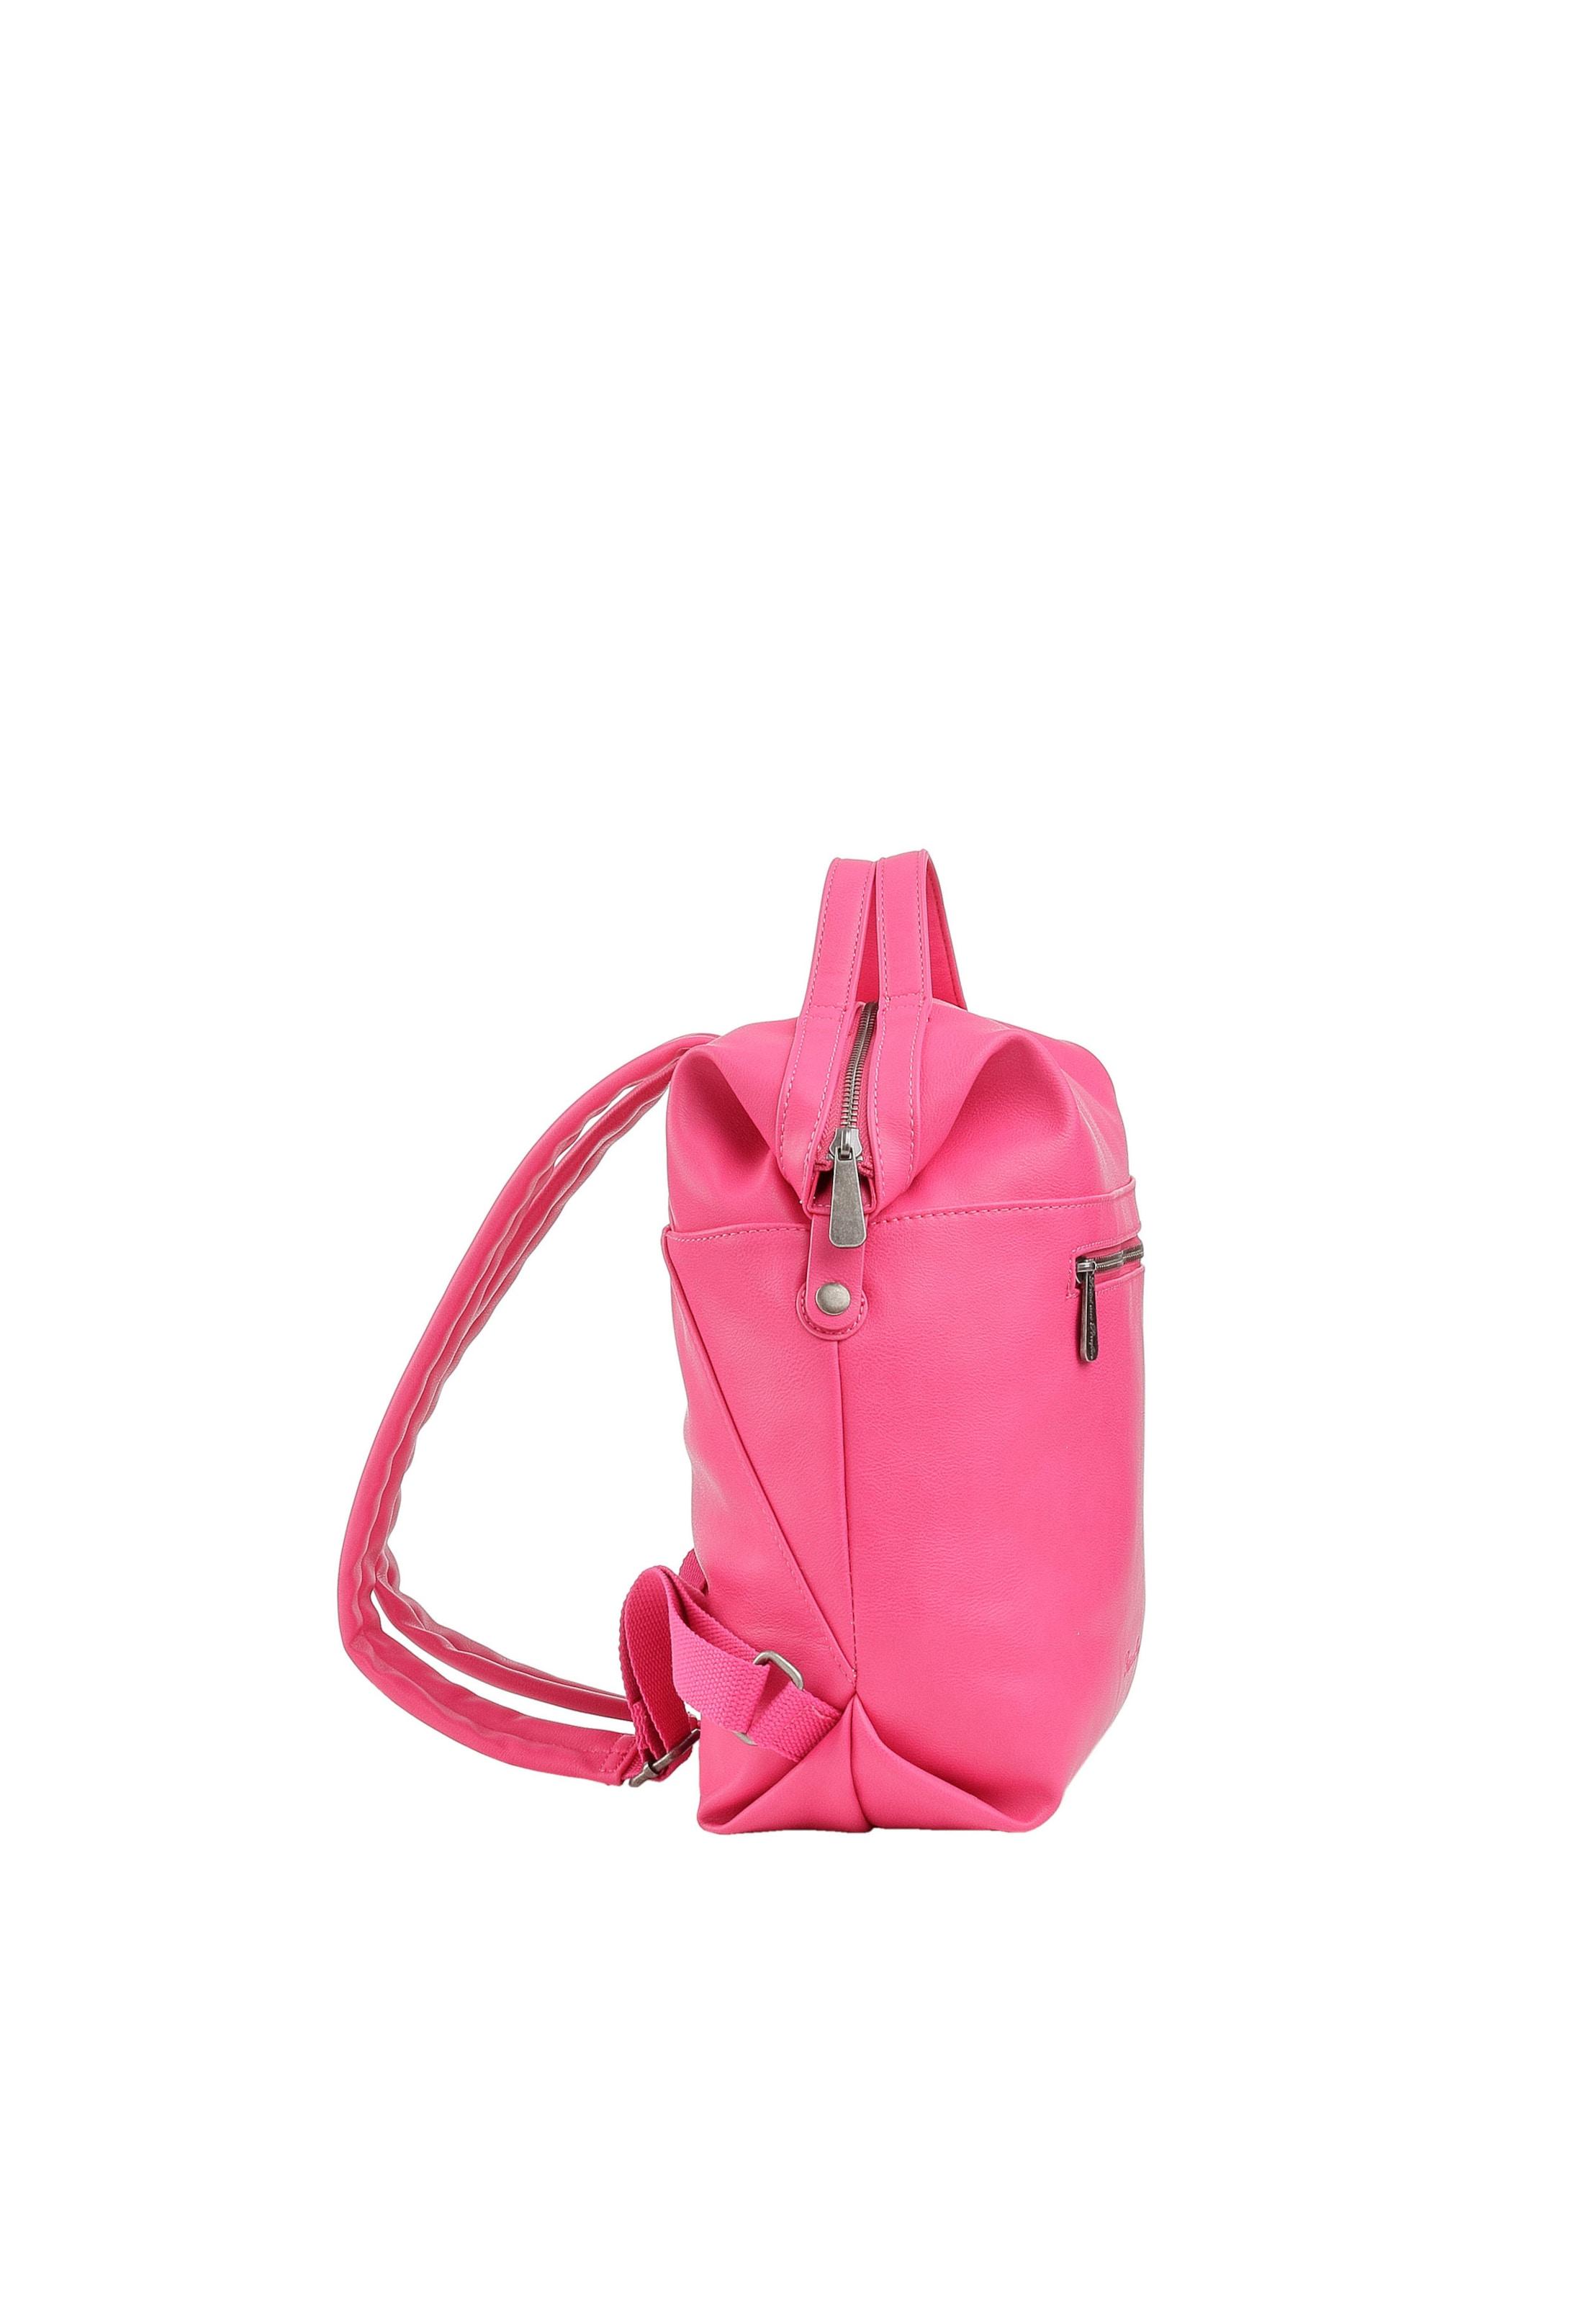 Philo' In 'harper Pink Aus Preußen Mini Daypack Fritzi TJ3FKc1l